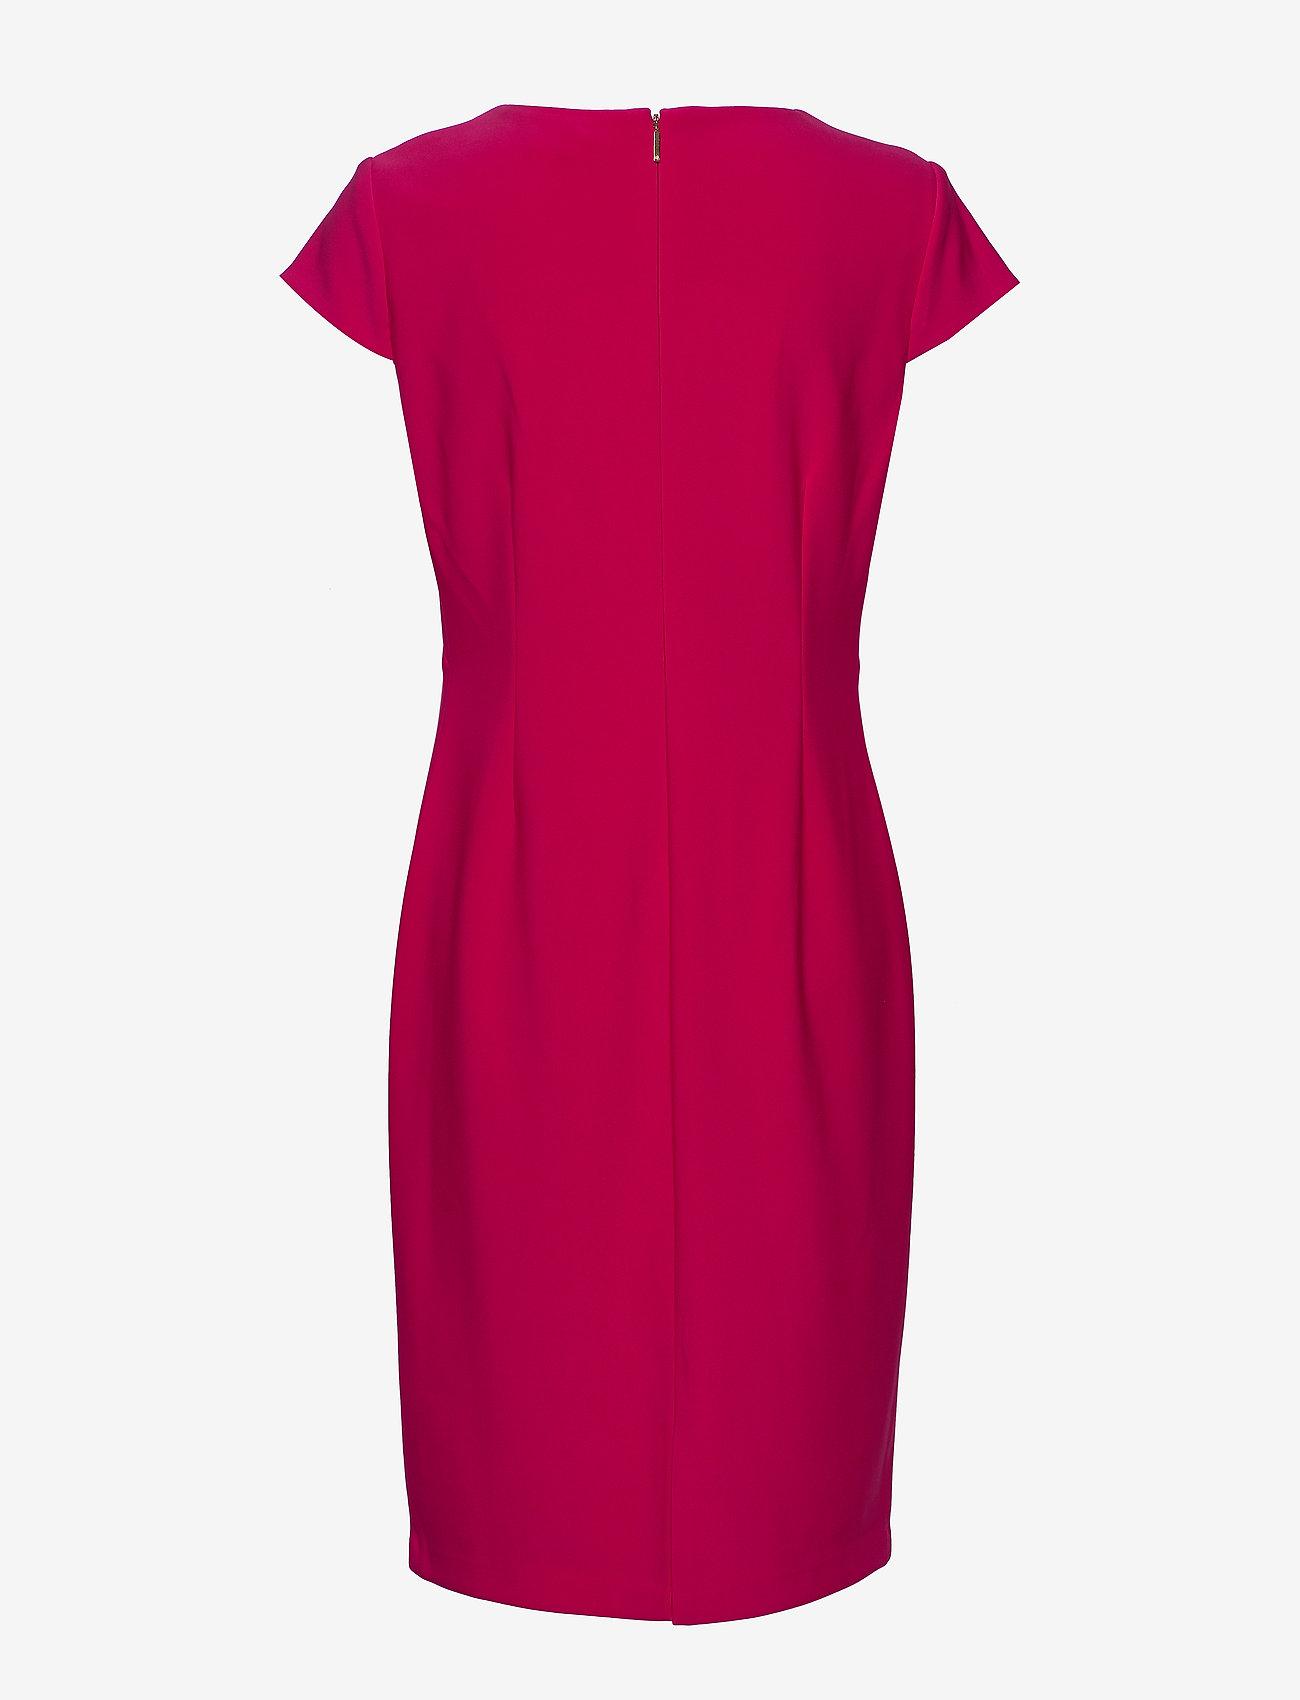 Lauren Ralph Lauren Cap-Sleeve Jersey Dress - Sukienki BERRY SORBET - Kobiety Odzież.